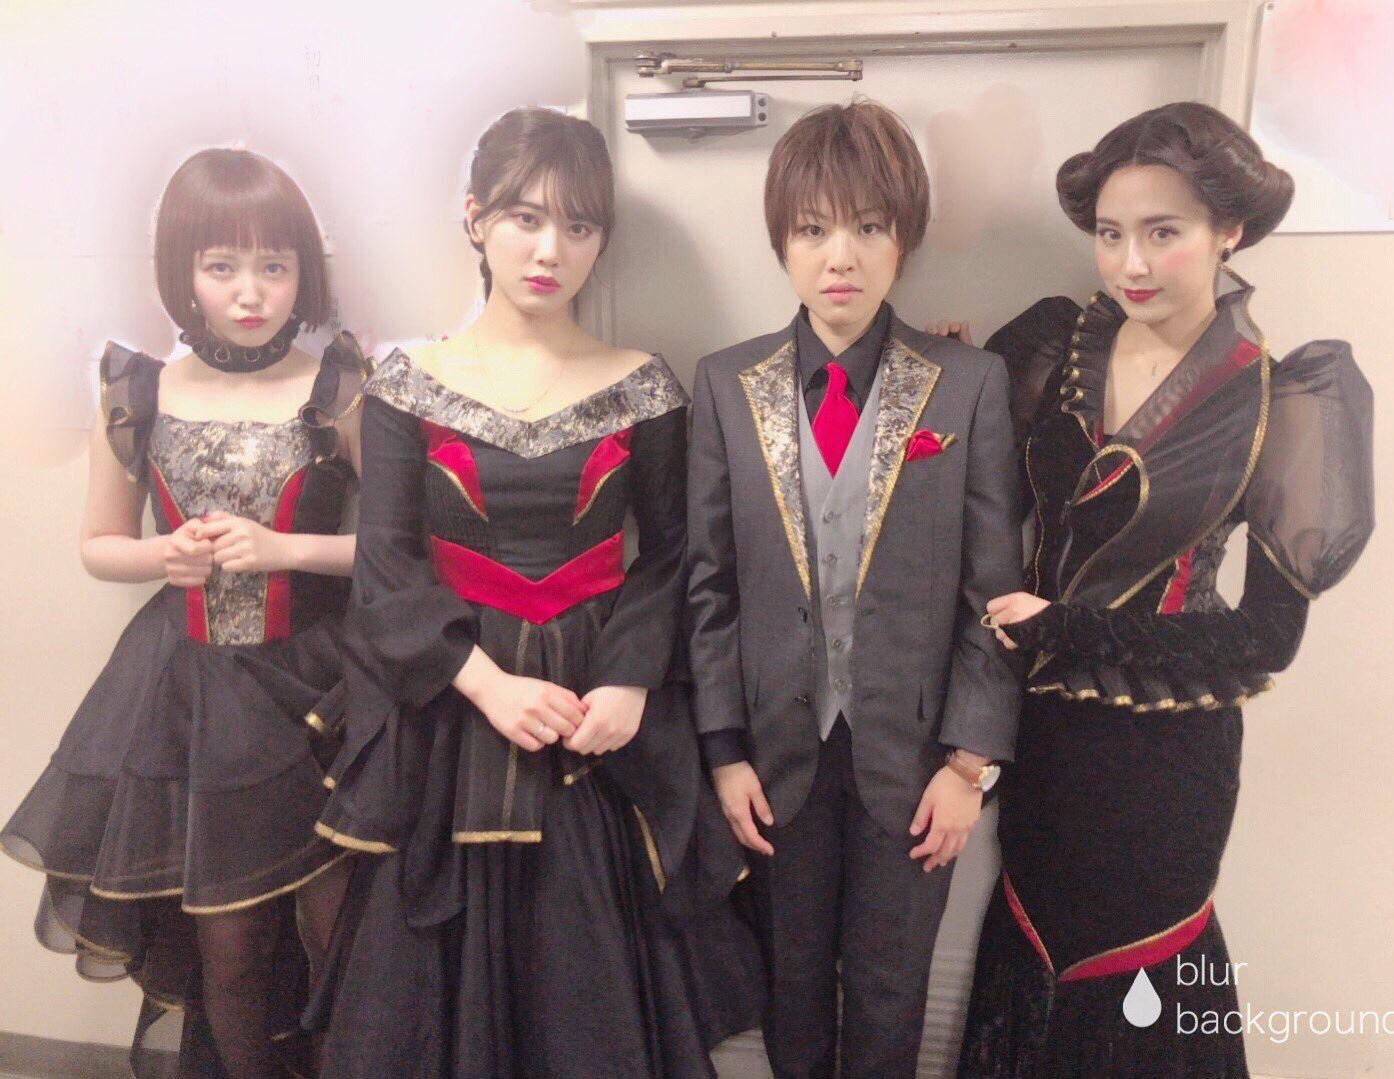 五十鈴ココ 舞台 三人姉妹4